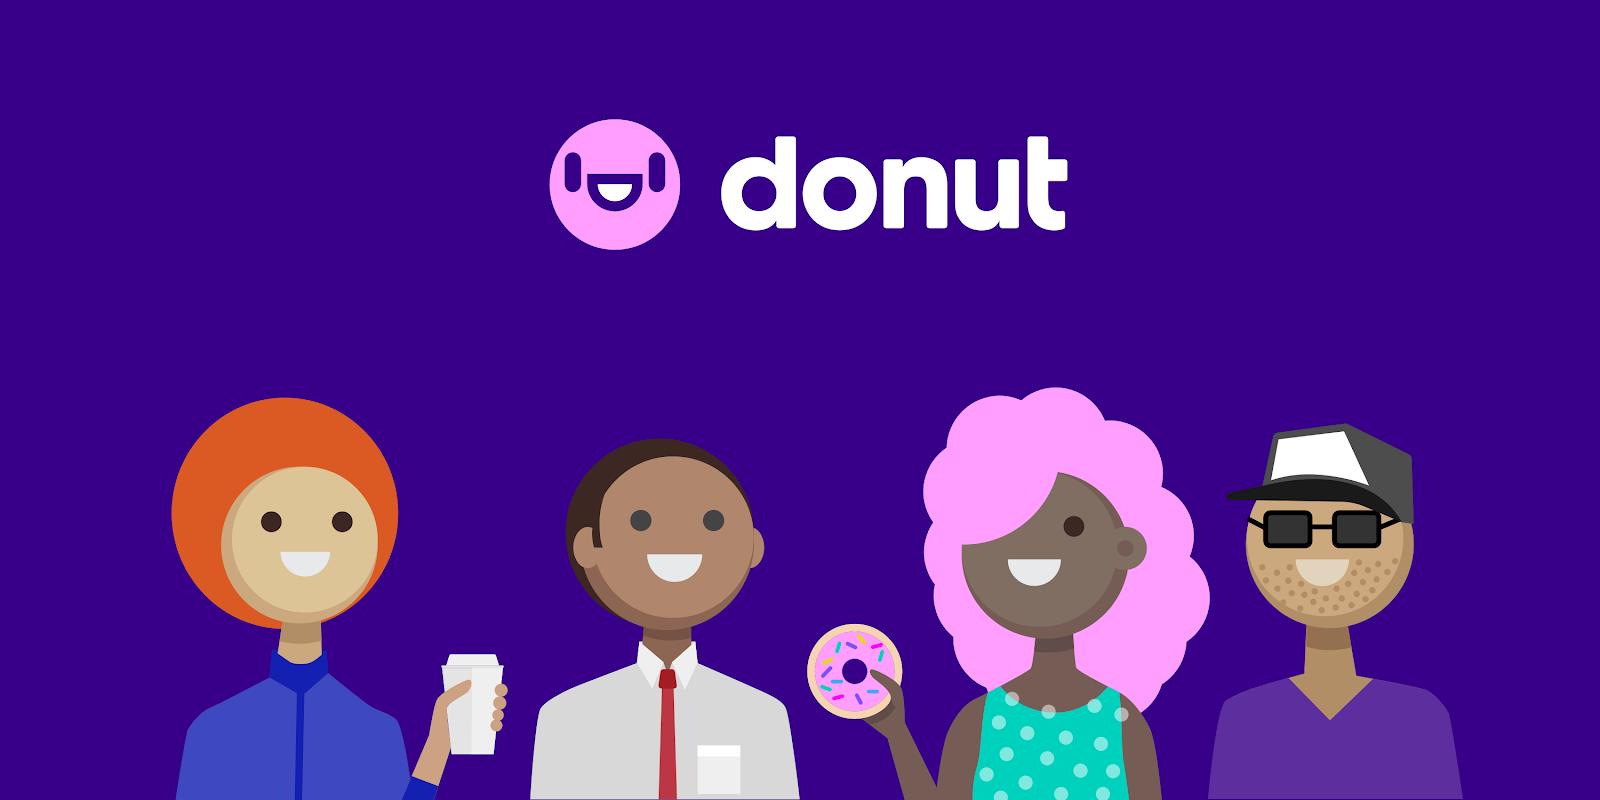 A screengrab of Donut